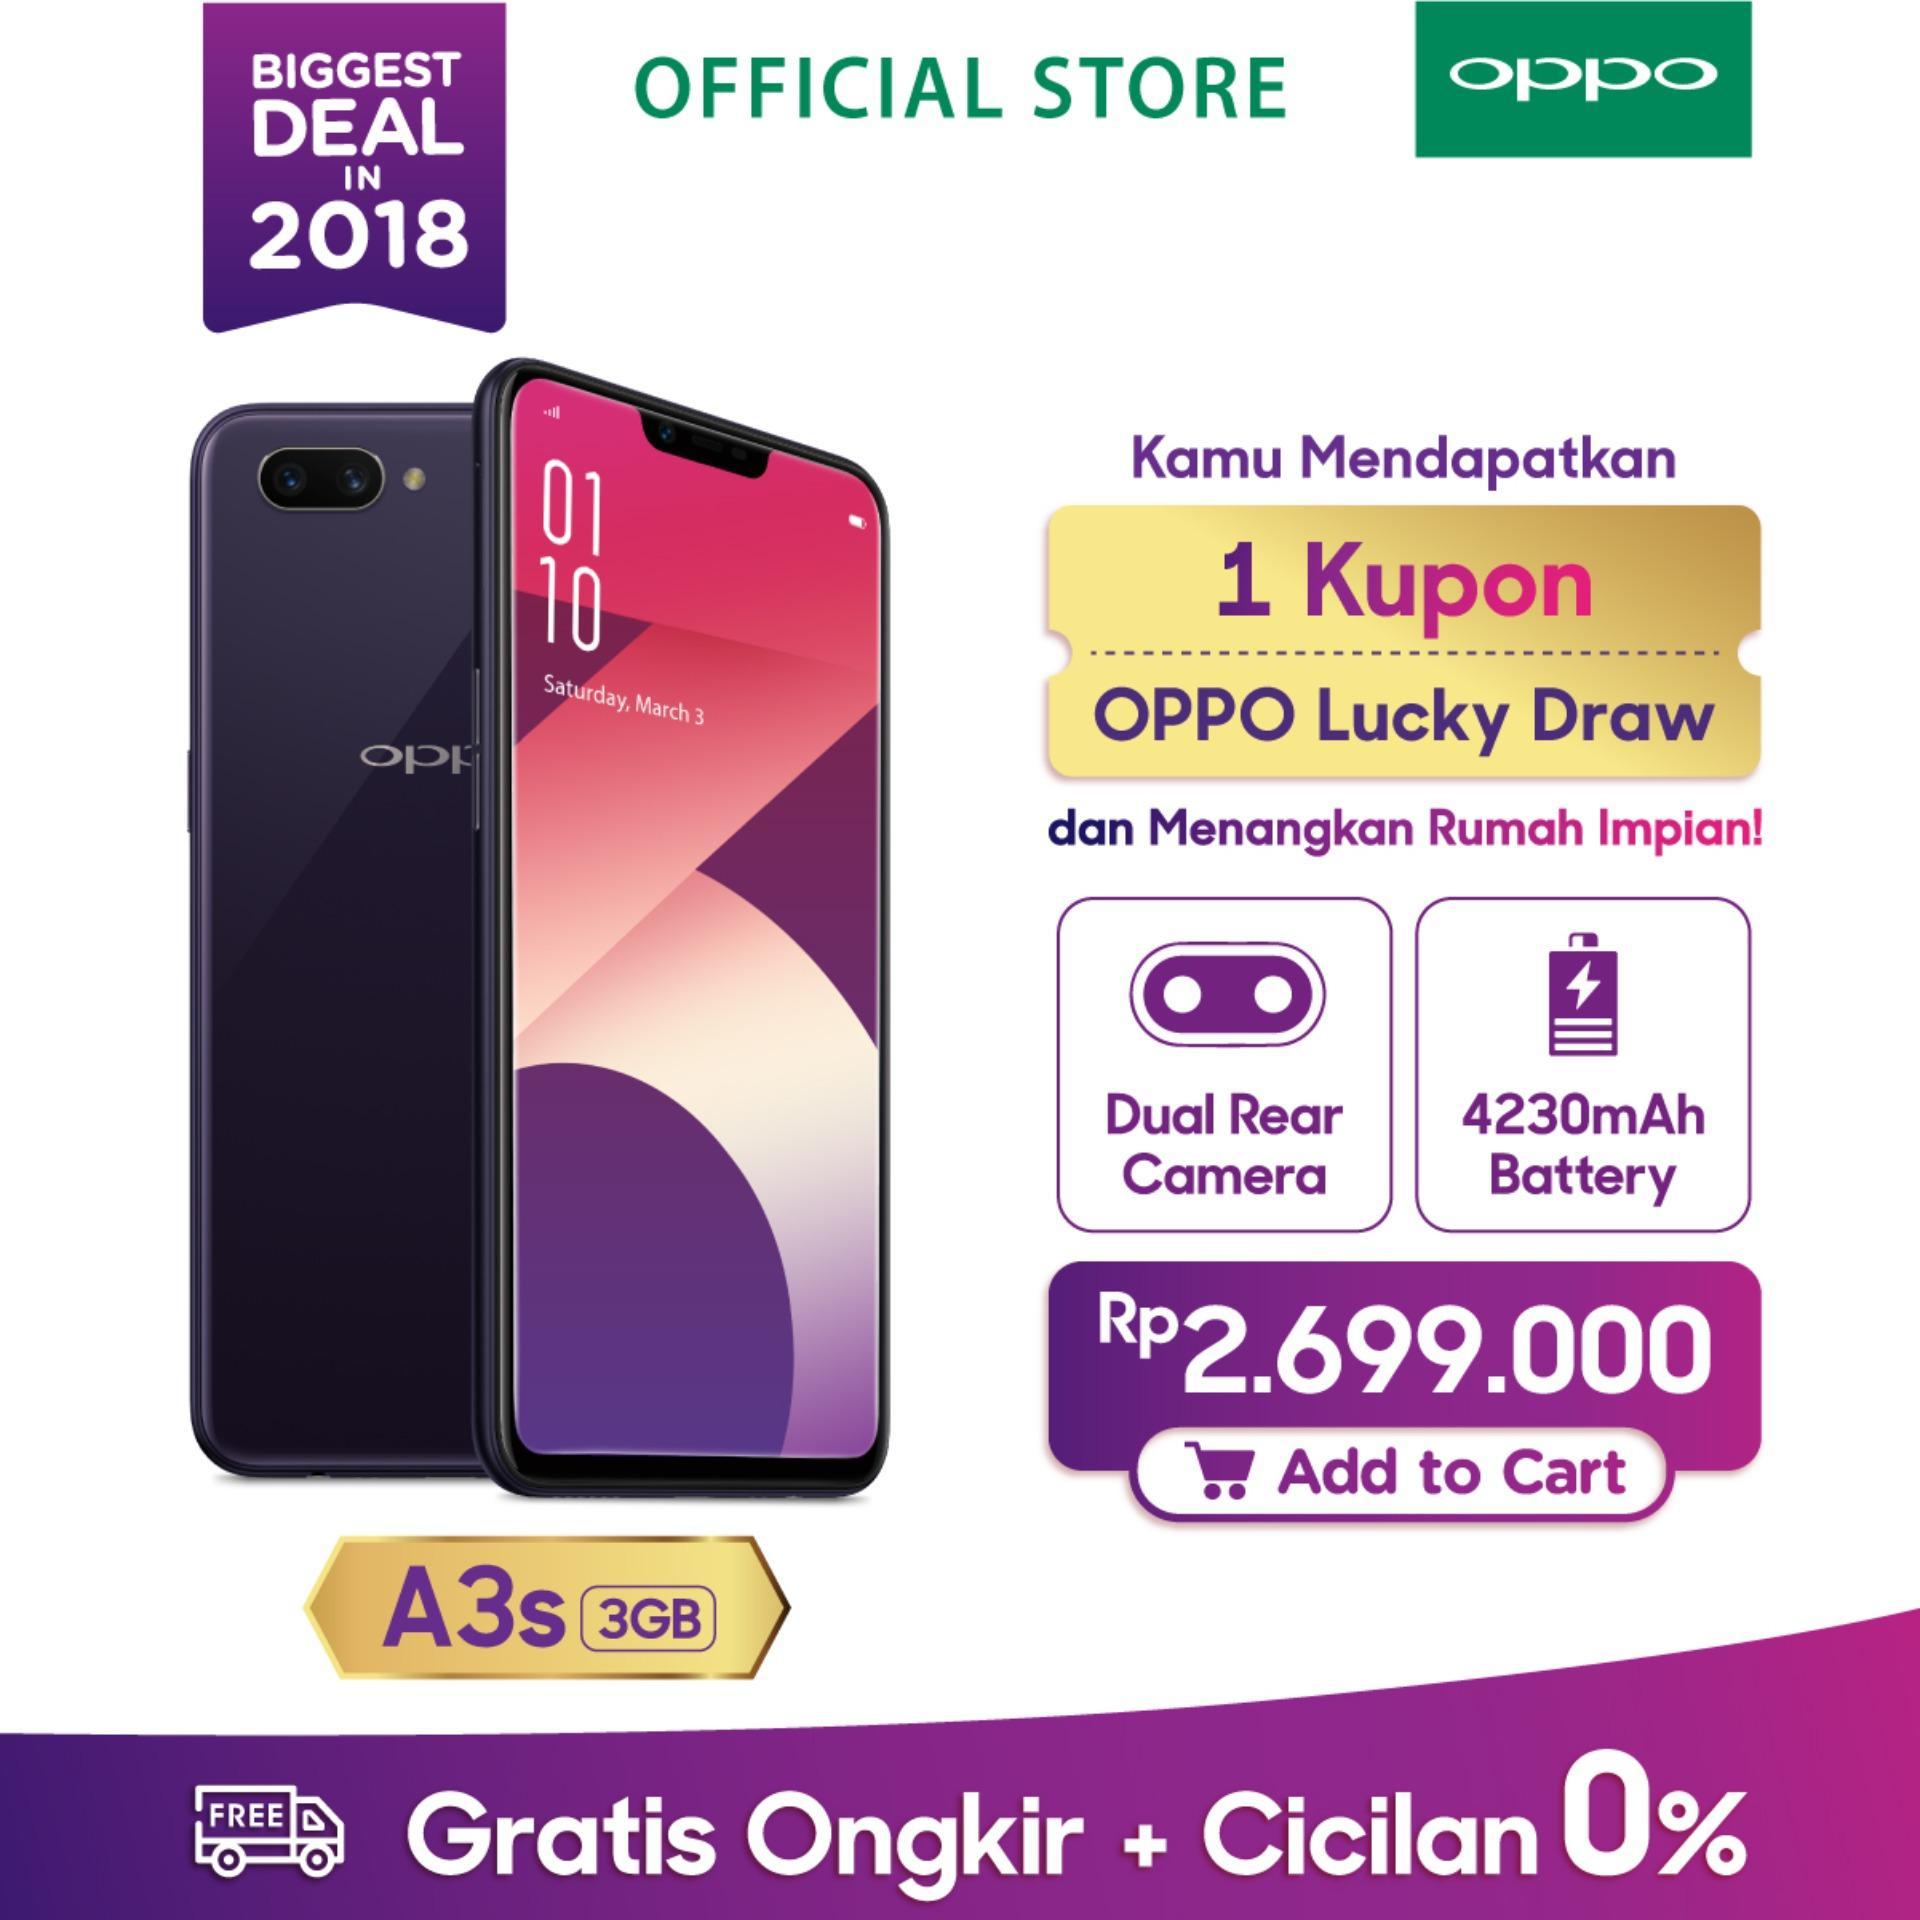 OPPO A3S SMARTPHONE 3GB/32GB , A.I Beauty, Dual Camera, Super Full Screen (COD, Garansi Resmi OPPO, Cicilan tanpa kartu kredit, Cicilan 0%, Gratis Ongkir)